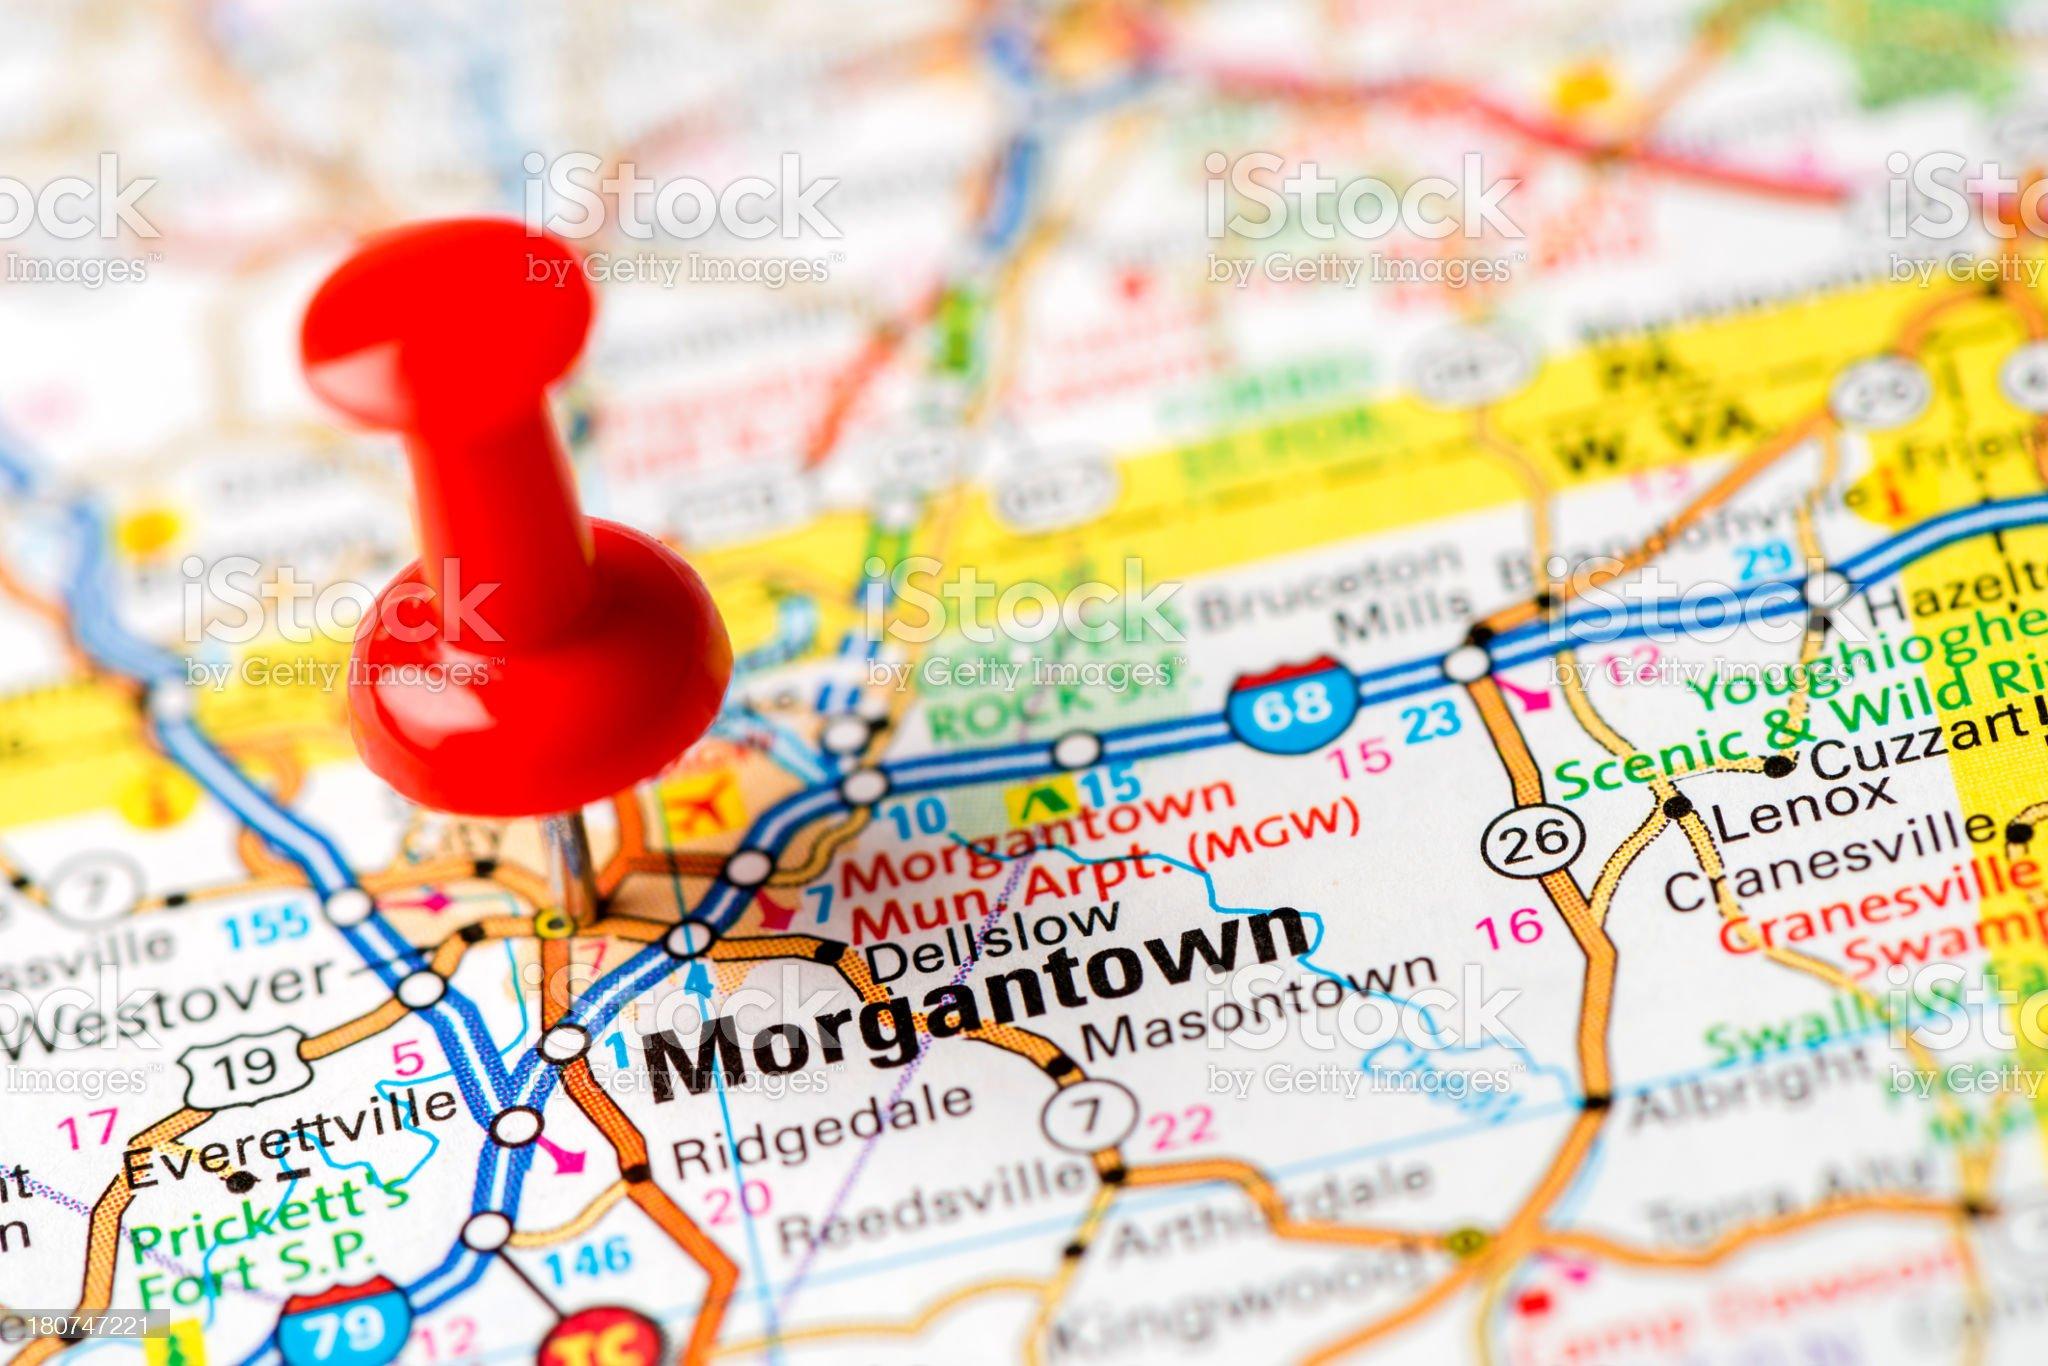 US capital cities on map series: Morgantown, W.VA. royalty-free stock photo